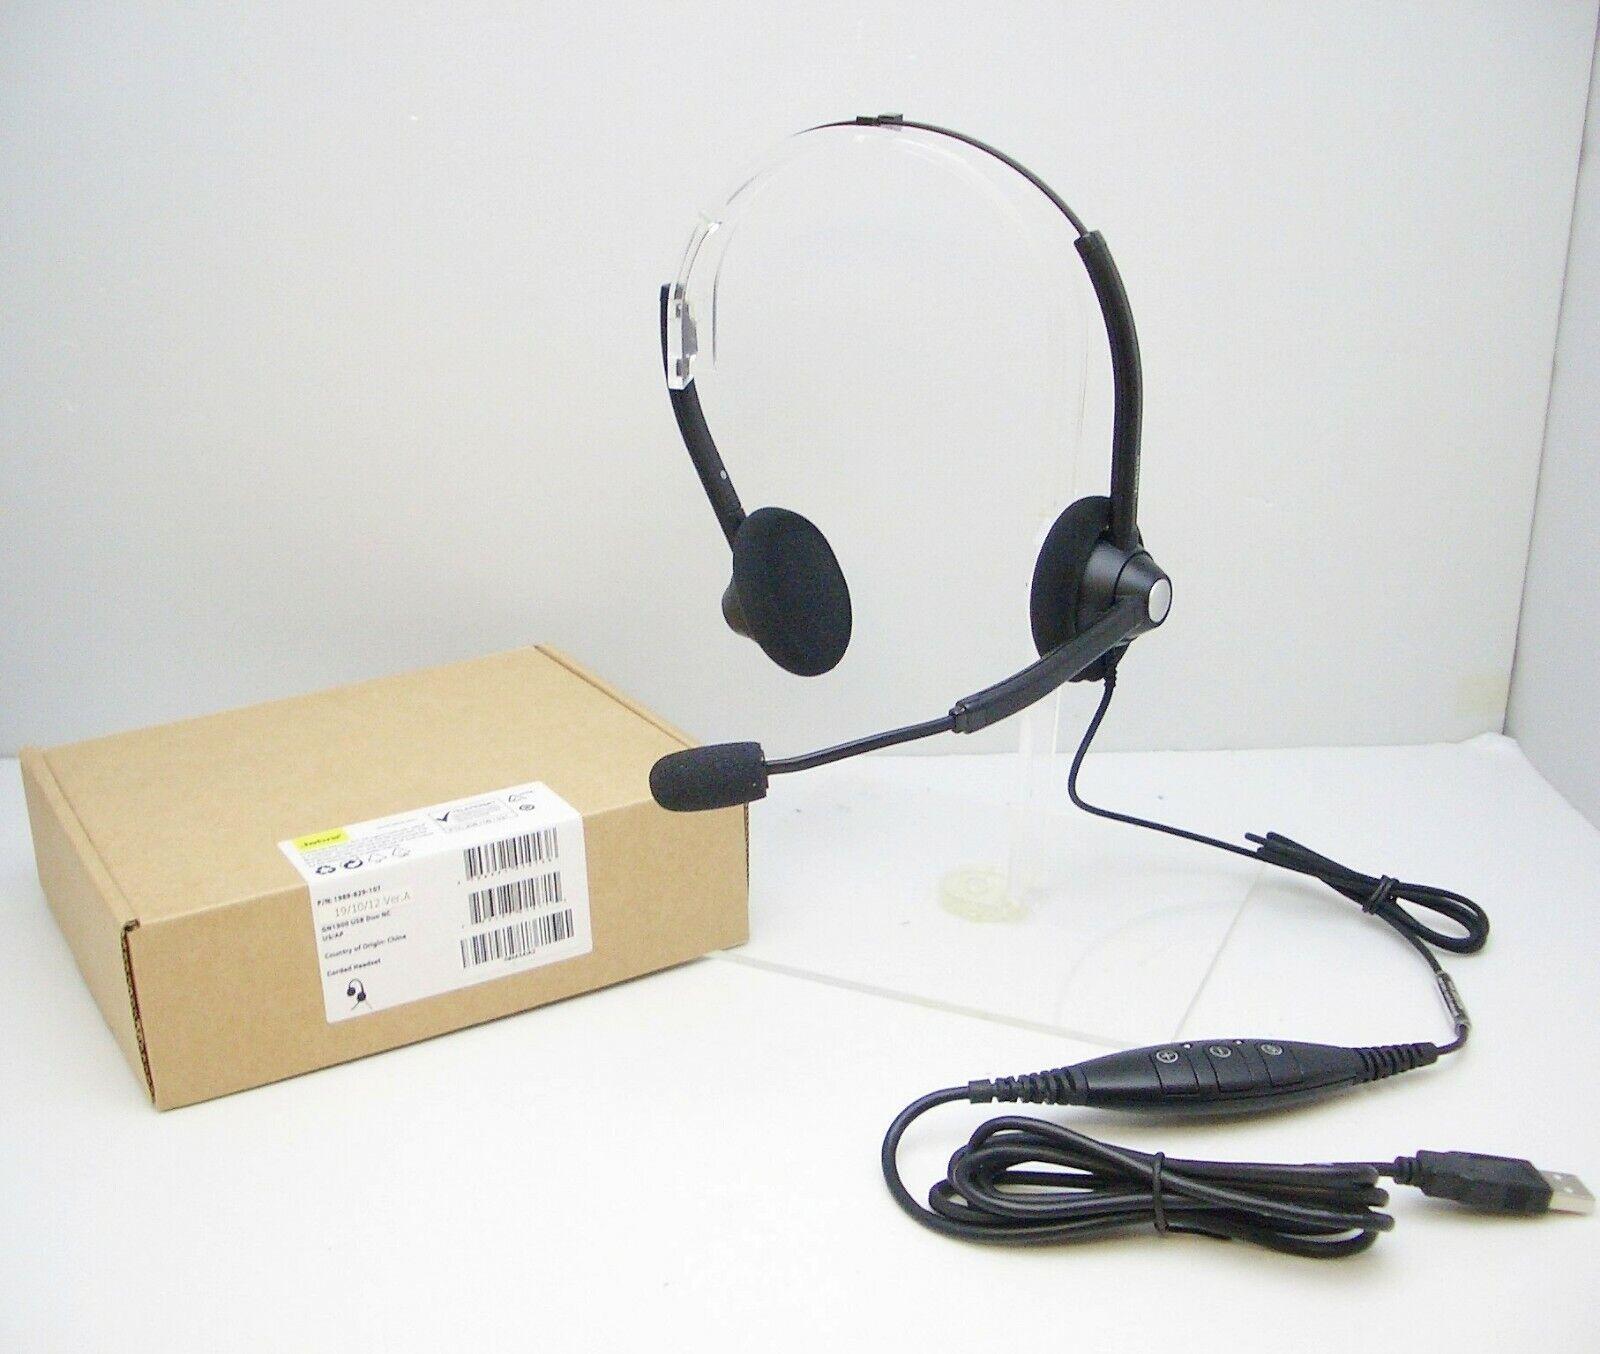 Jabra / GN Netcom BiZ 1900 USB DUO Noise-Canceling VoIP PC H